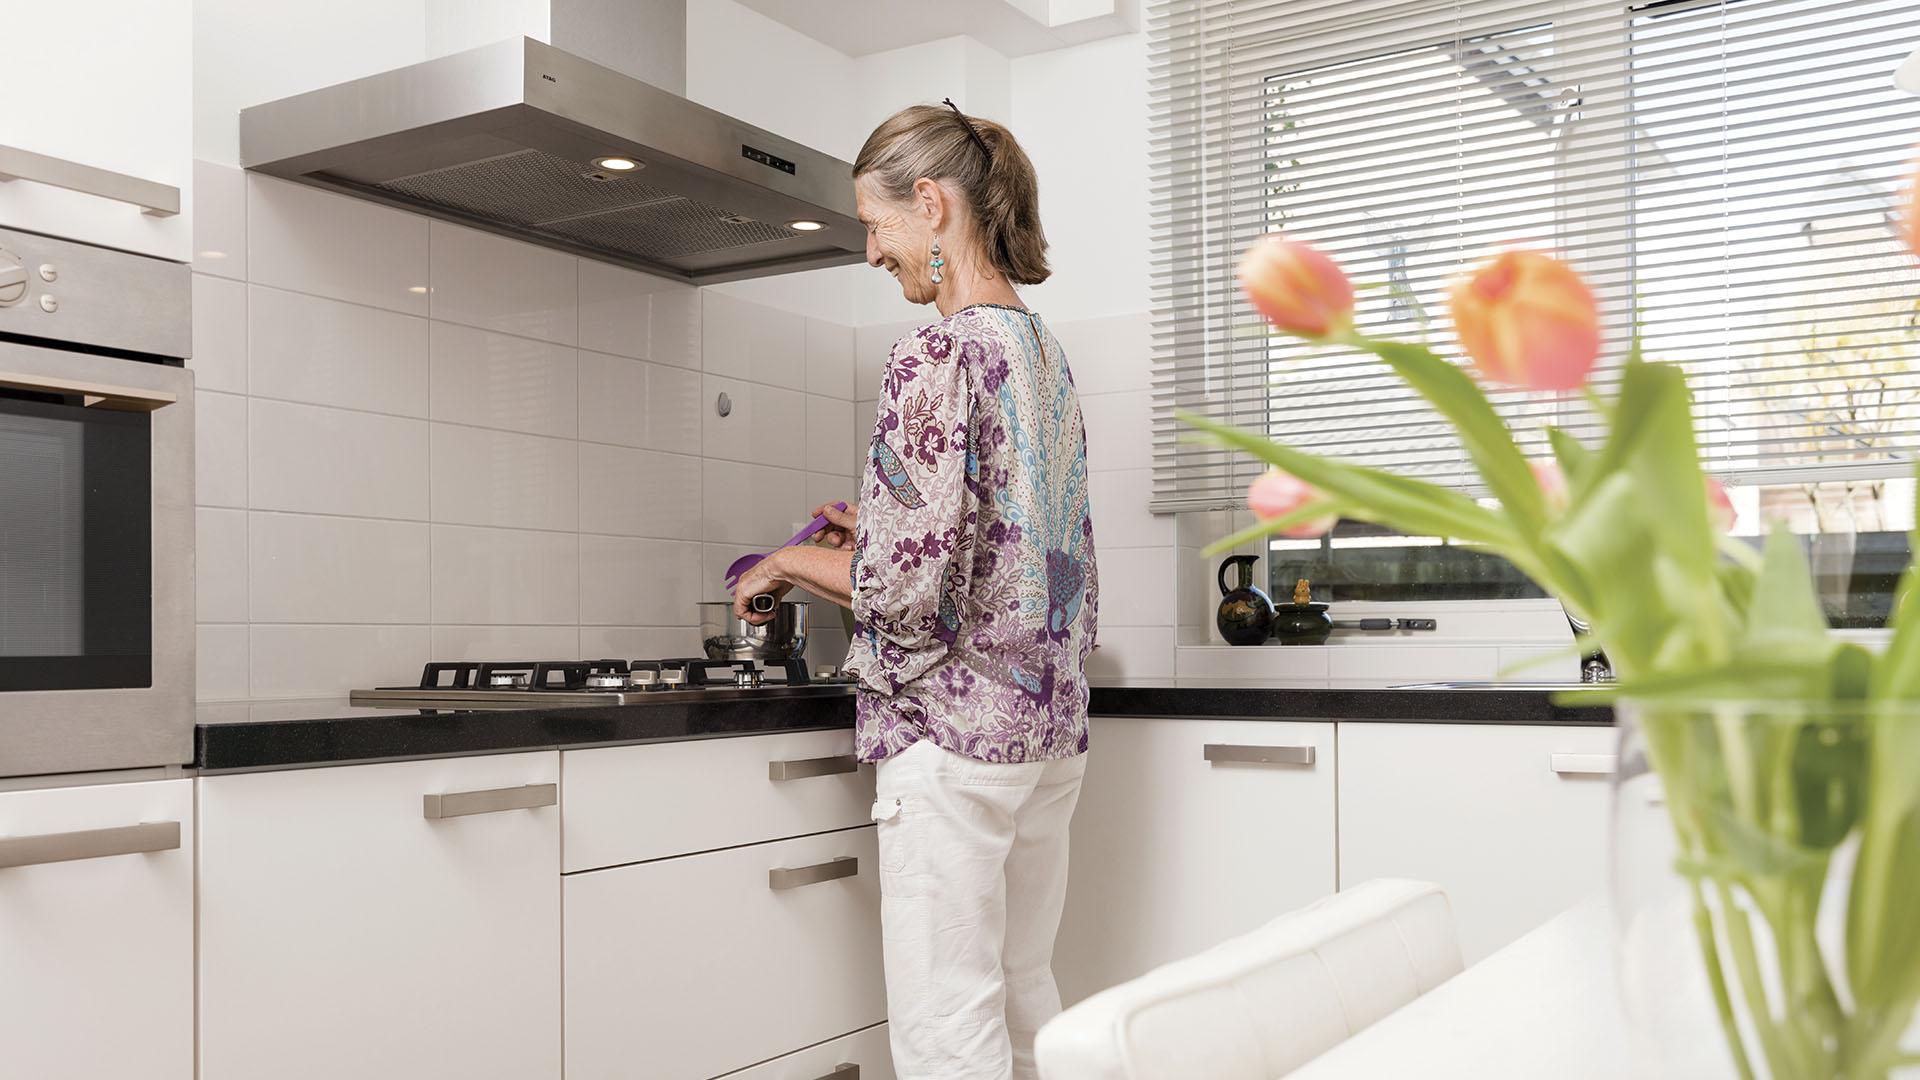 Ecologisch keuken programma